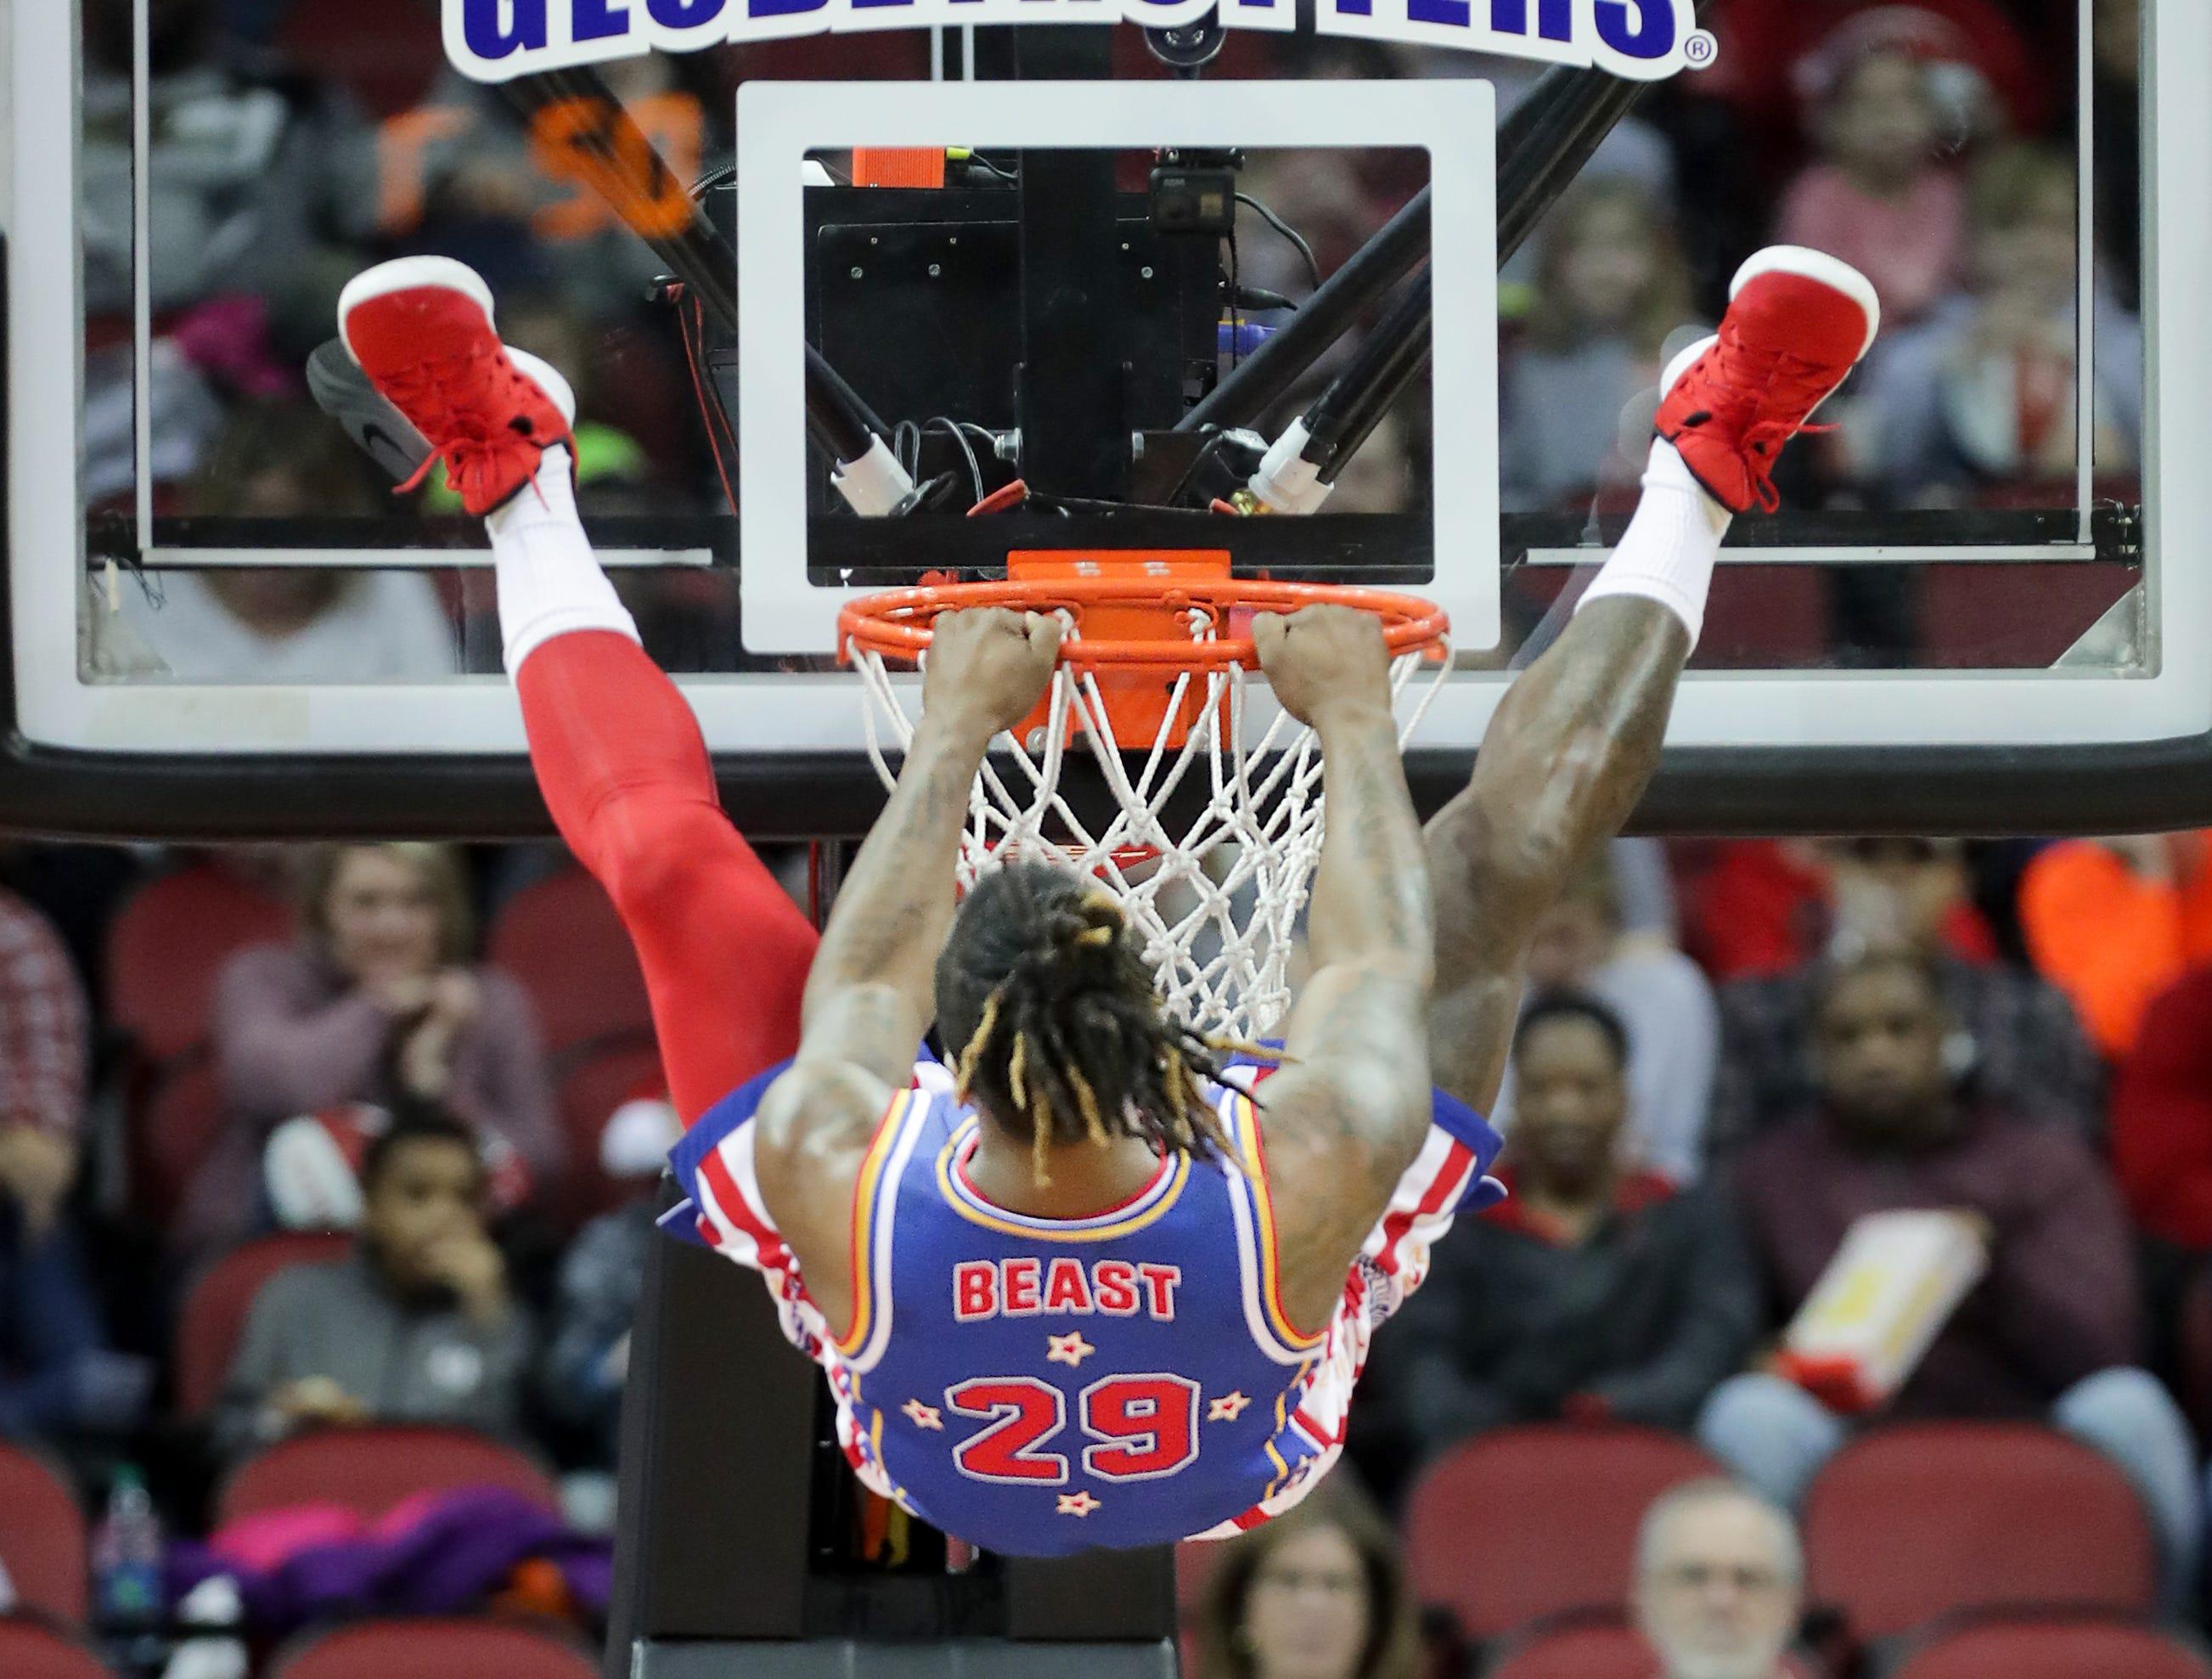 Harlem Globetrotters' Beast hangs on the rim after a slam dunk. Jan. 19, 2019